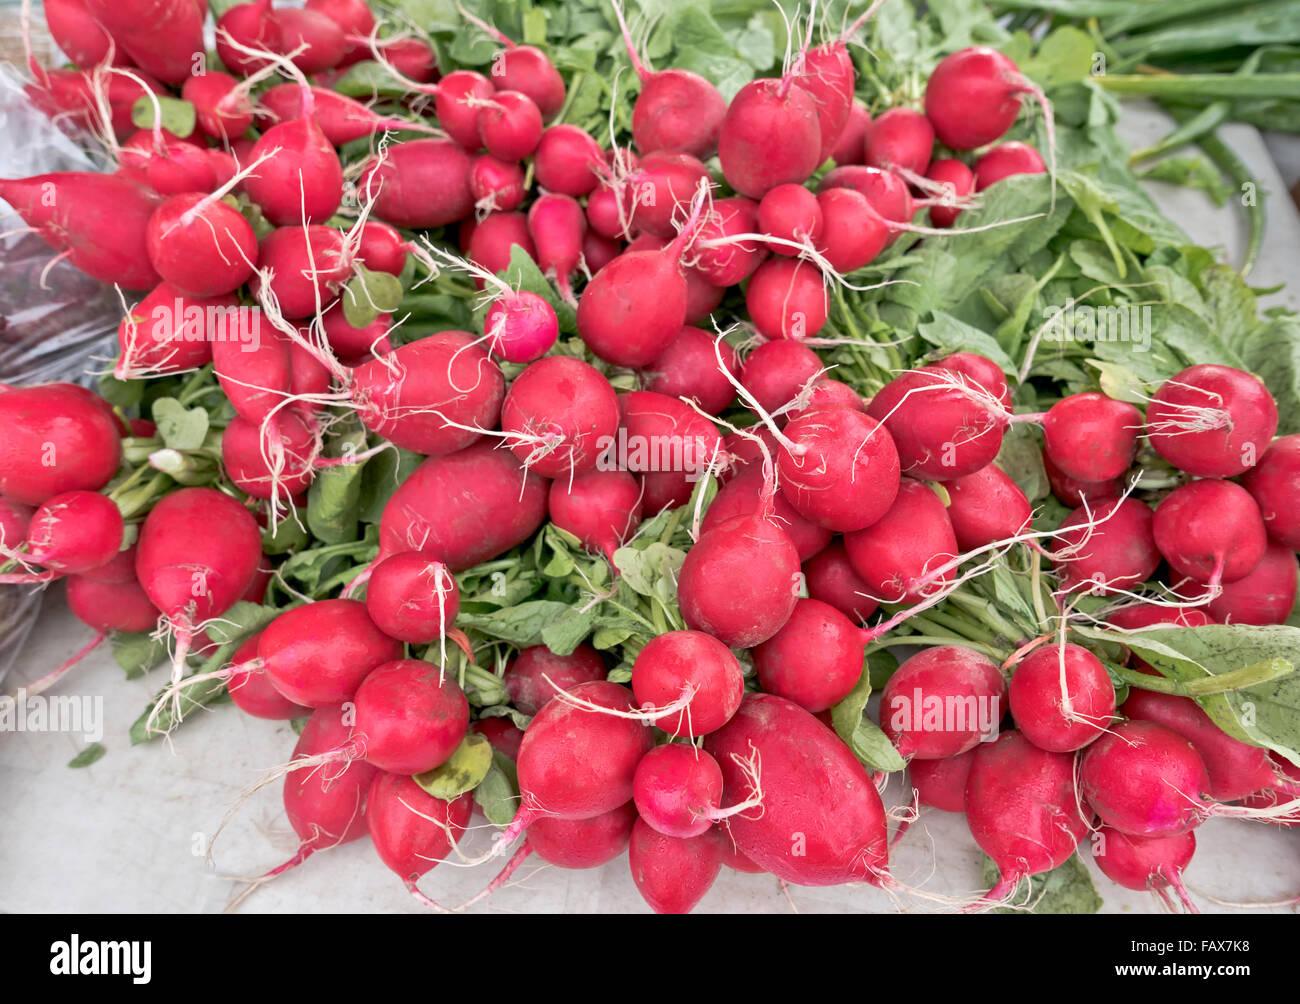 Bundled red radishes bundled, farmer's market. - Stock Image